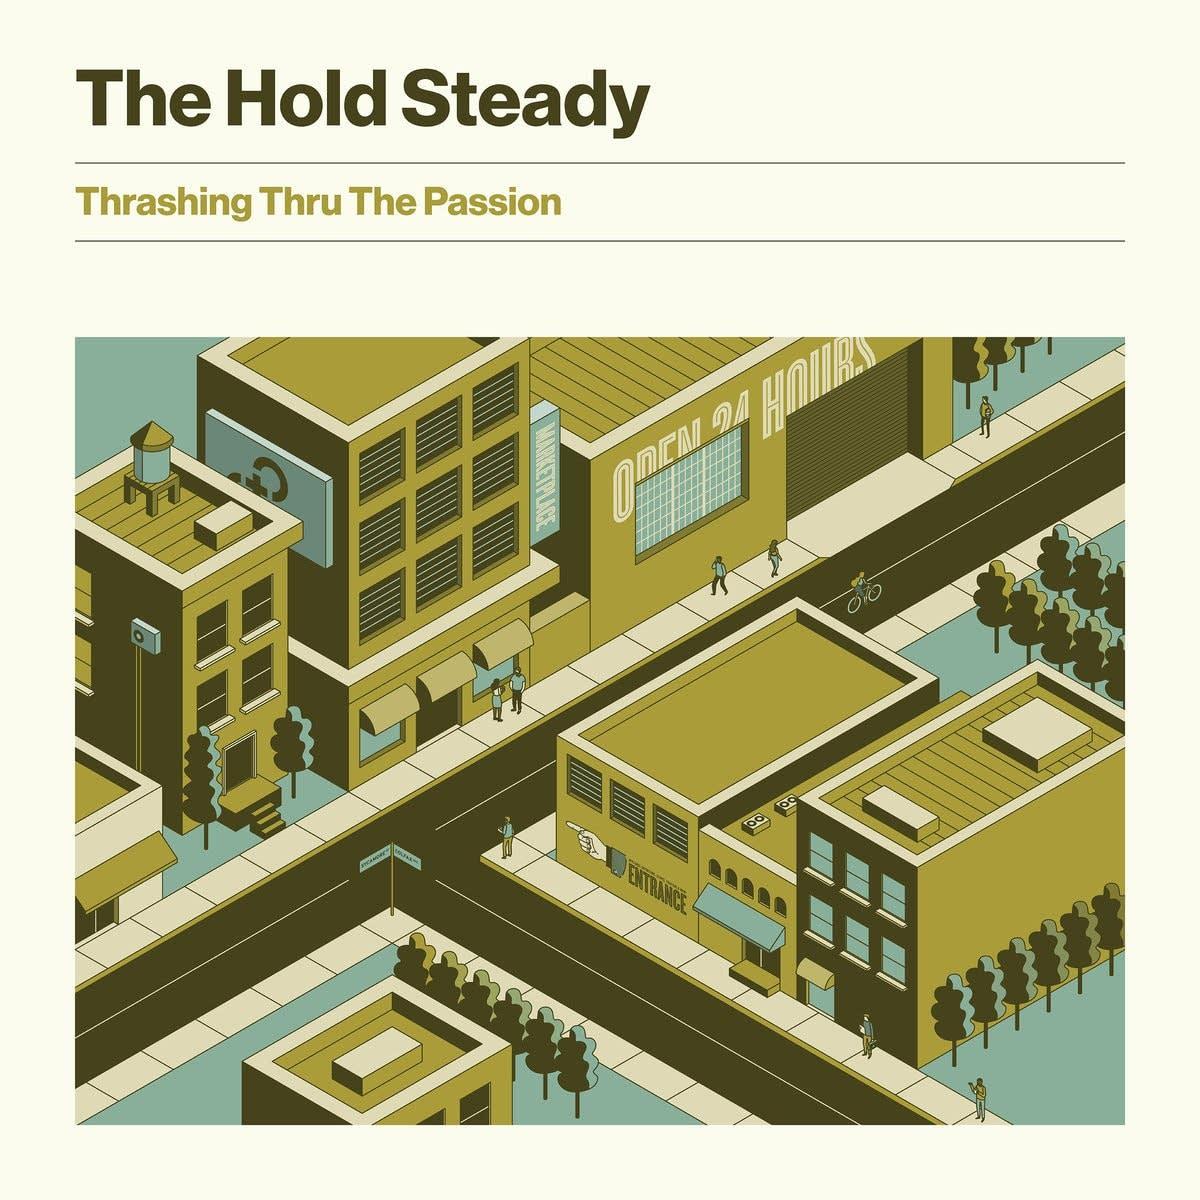 3f52ba-20190913-the-hold-steady-thrashing-thru-the-passion